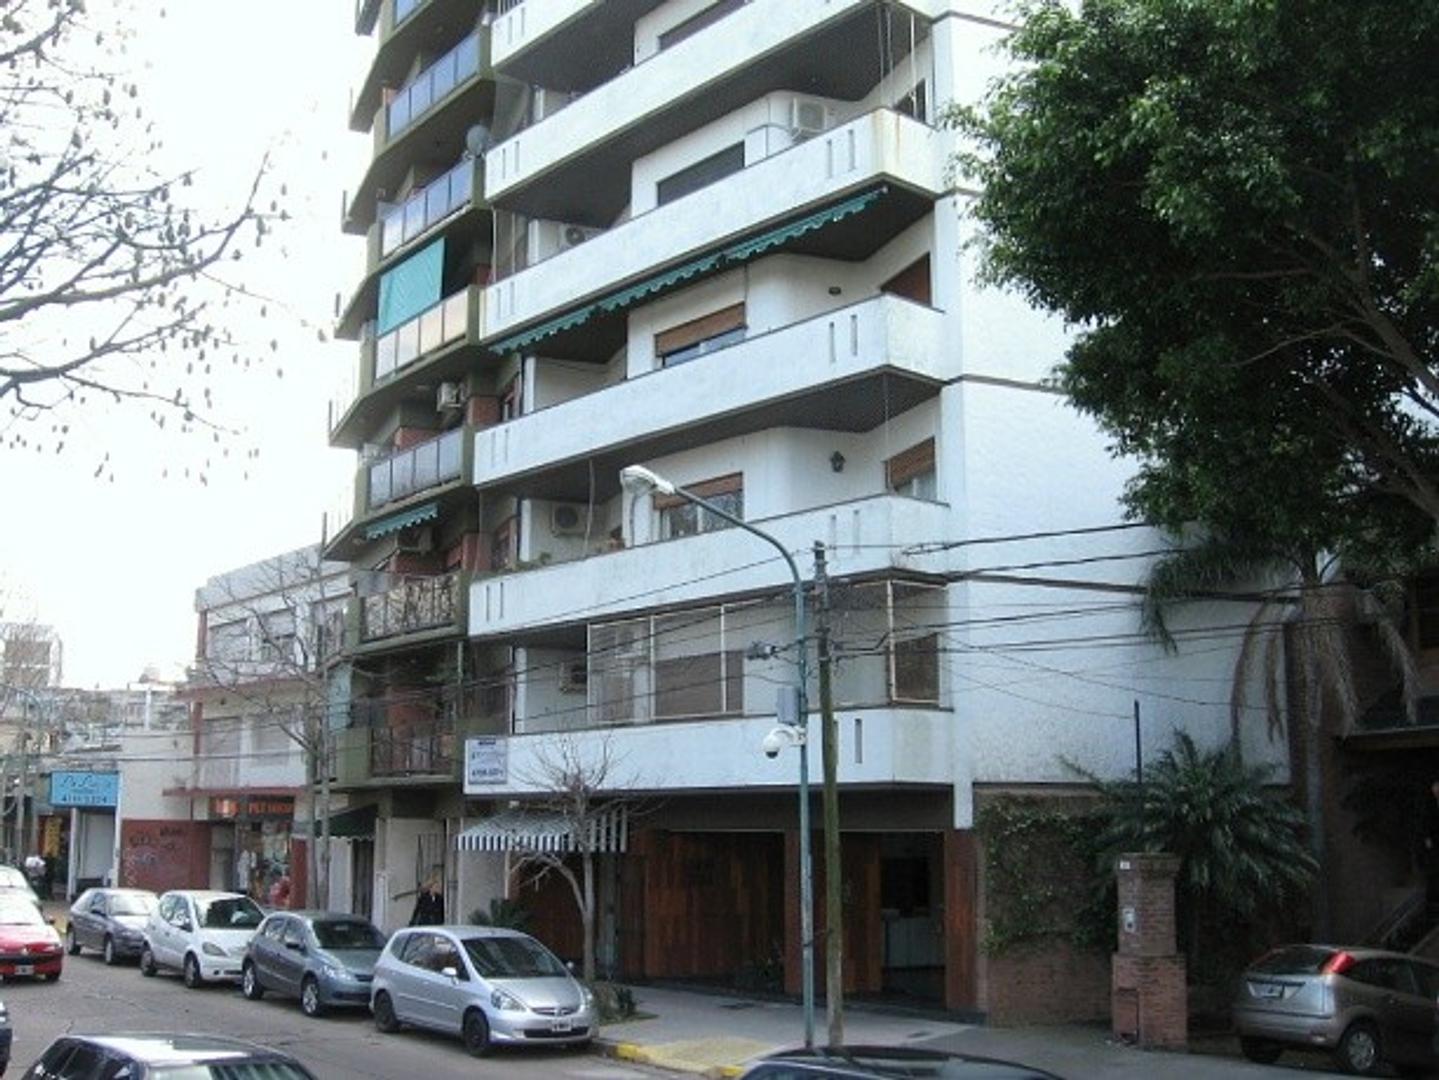 Departamento - Venta - Argentina, Vicente López - ELFLEIN 3761